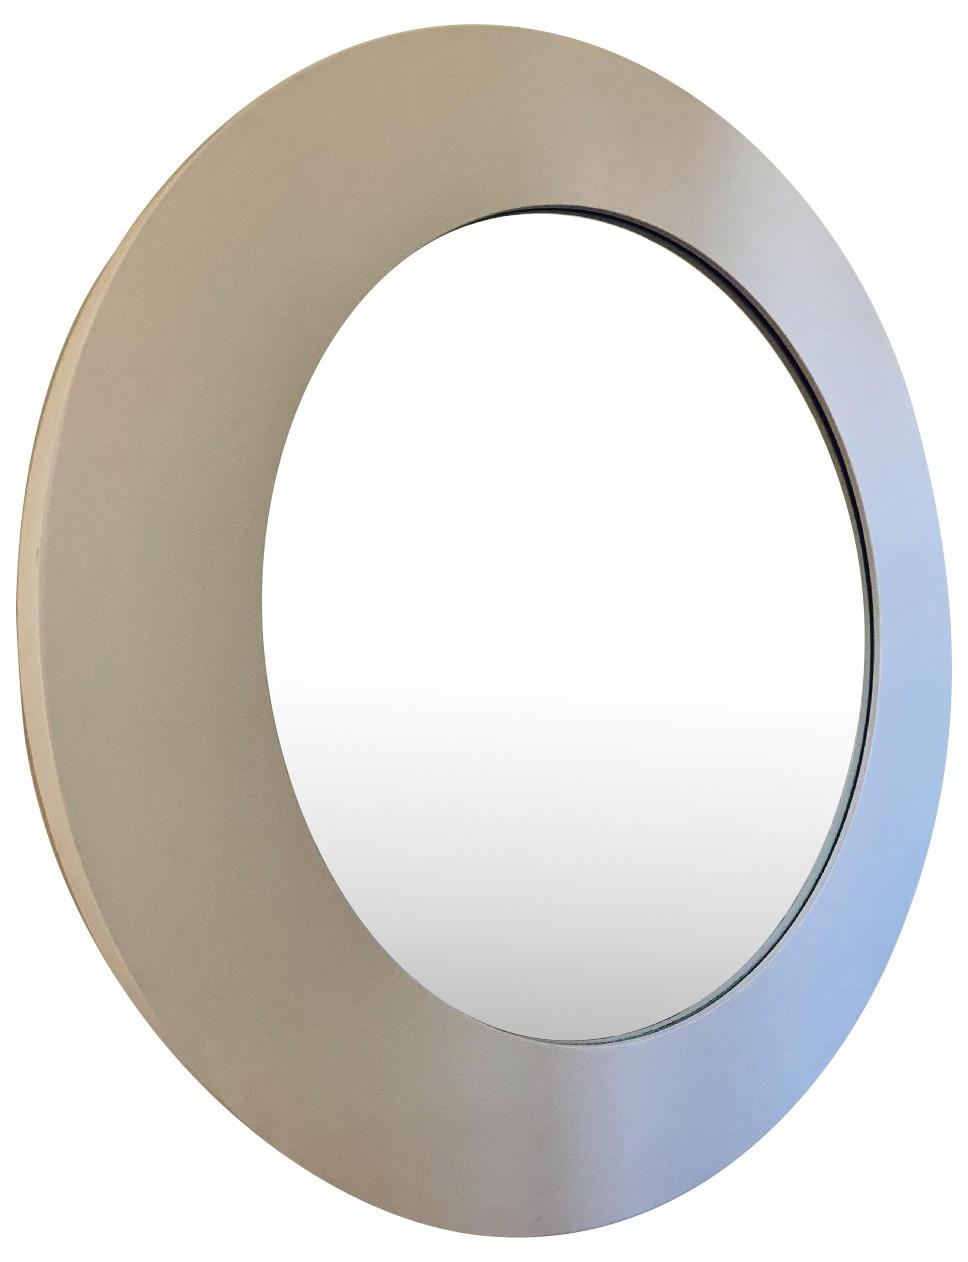 BoConcept White Glossy Lacquer Round Mirror